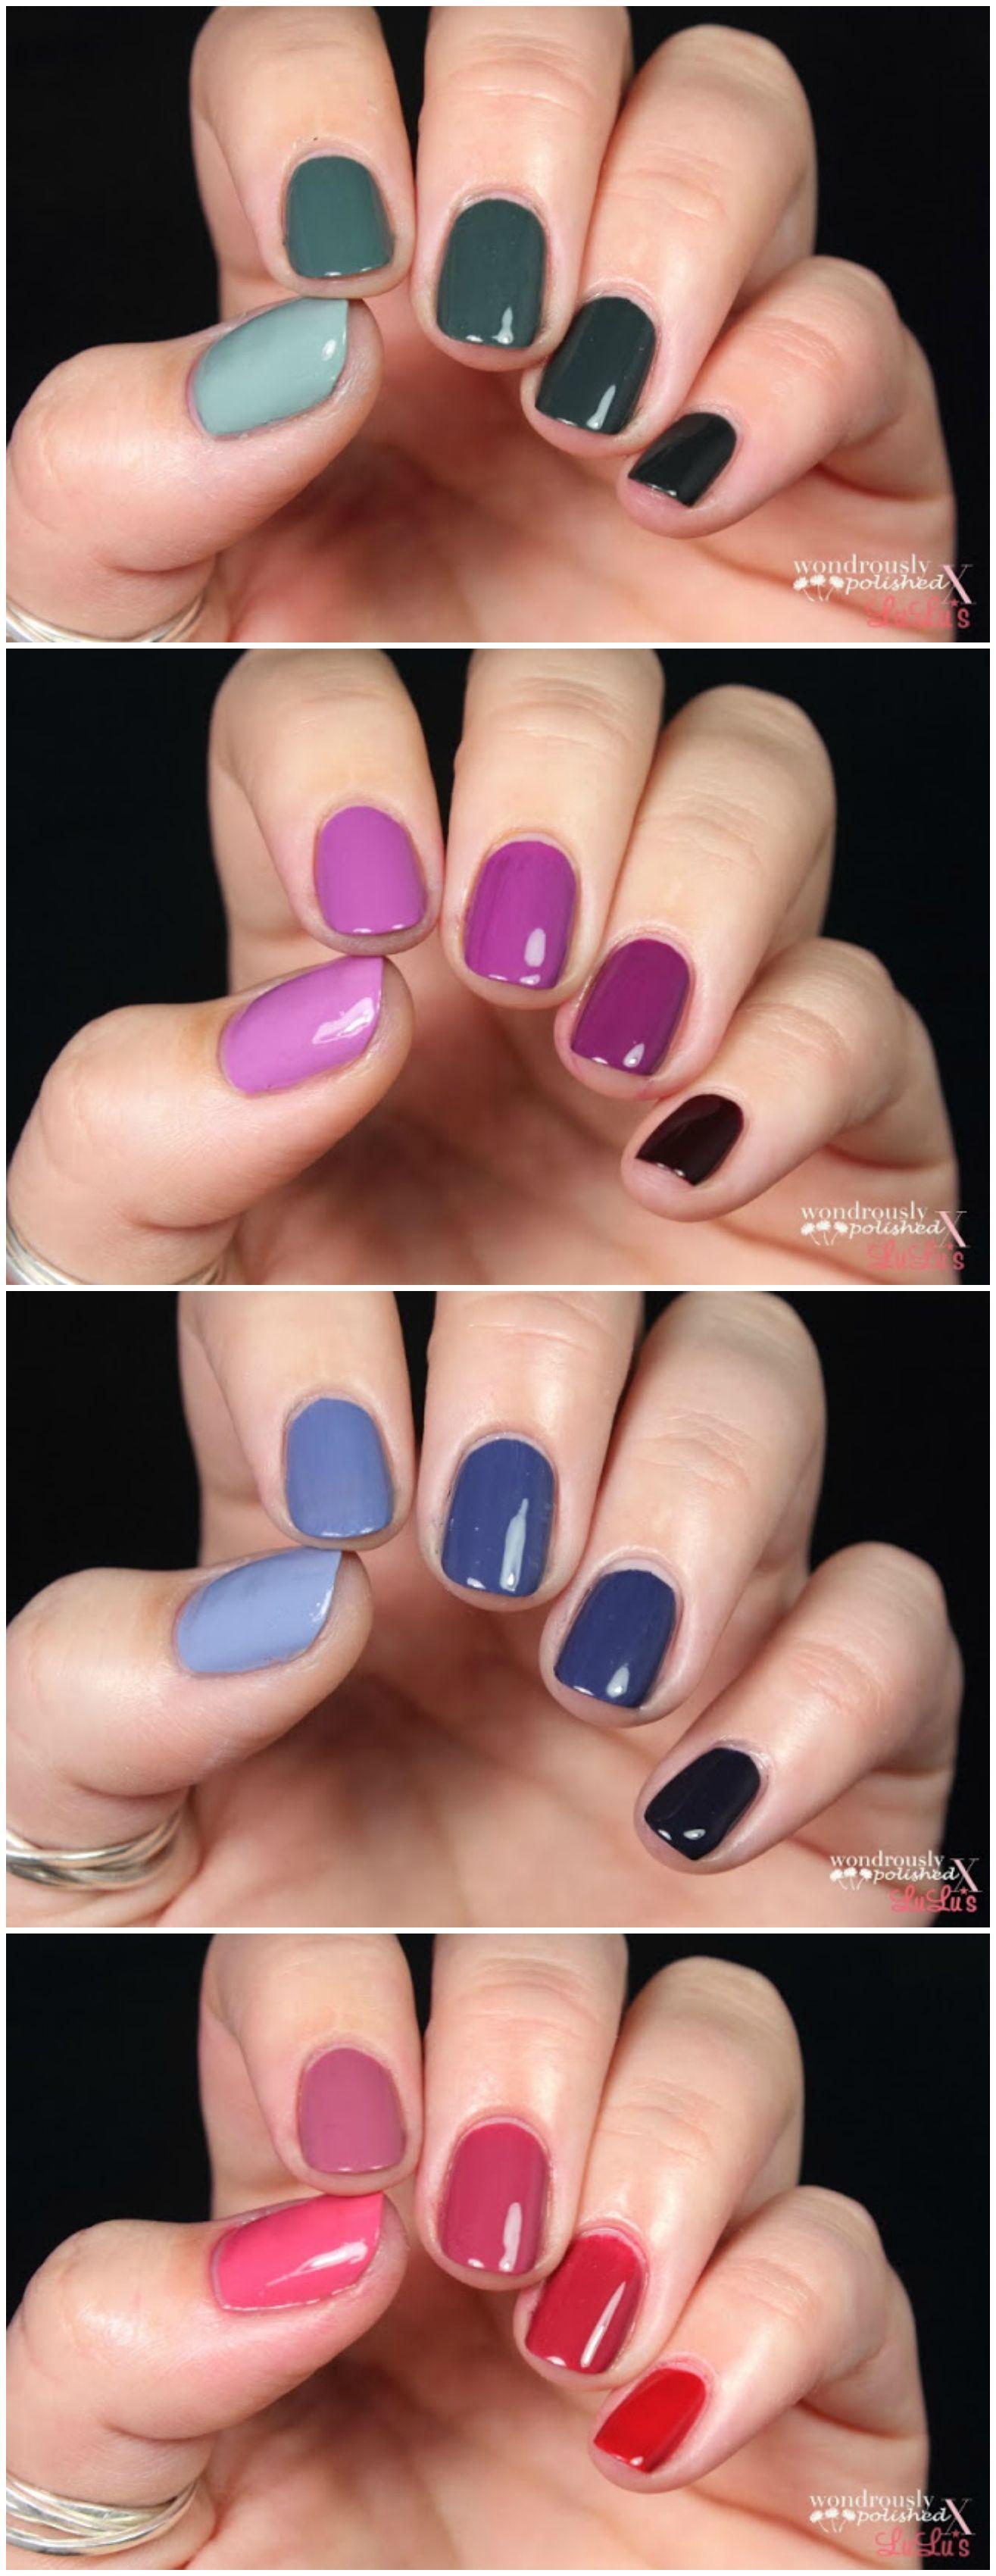 Nail art color violet - Mani Monday Five Color Ombre Nail Tutorial